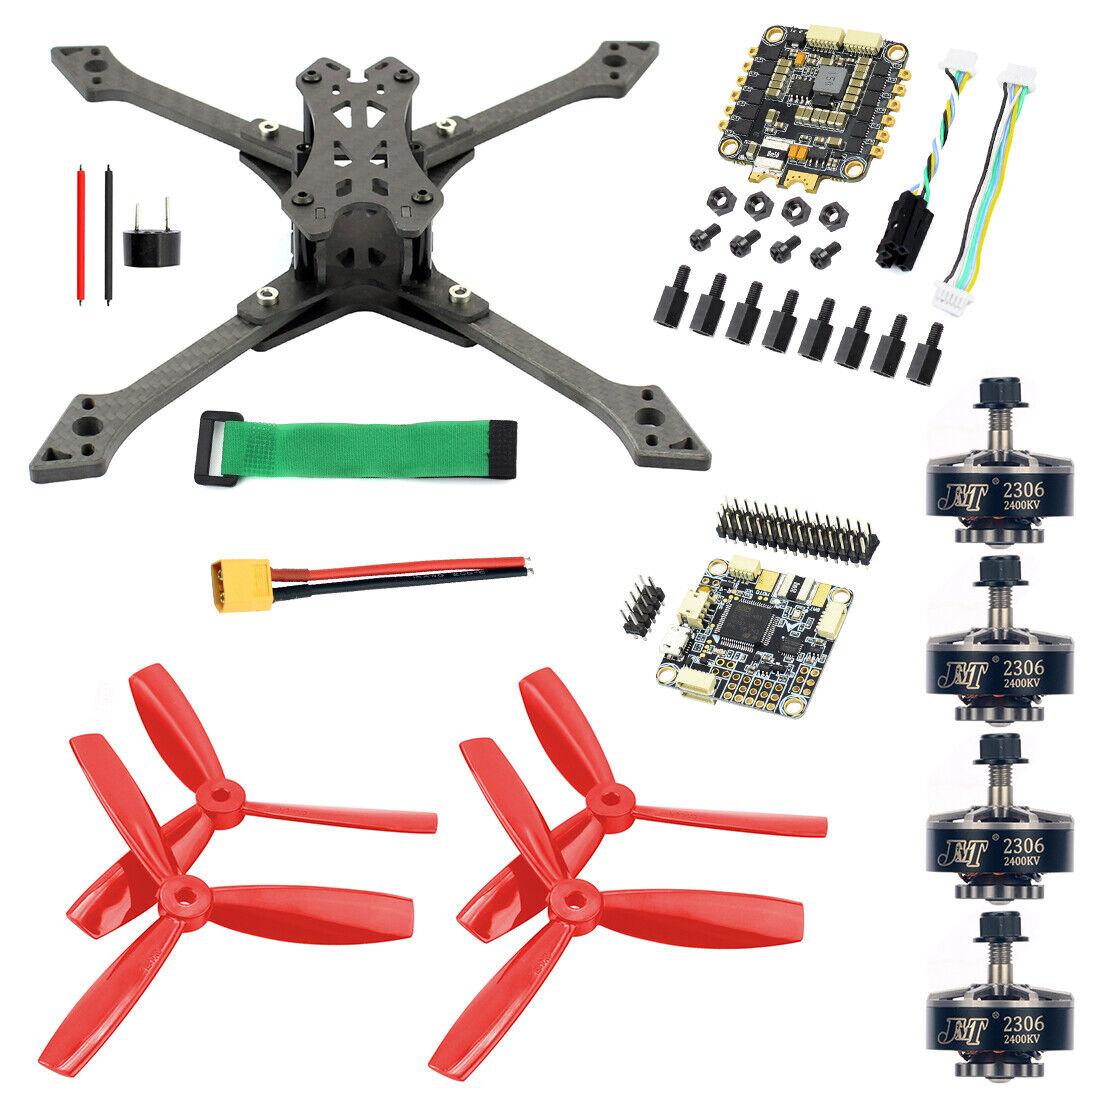 JMT HÁGALO USTED MISMO Vista en primera persona Racing Drone soldado Combo Kit BS430 30A Esc F4 Pro V2